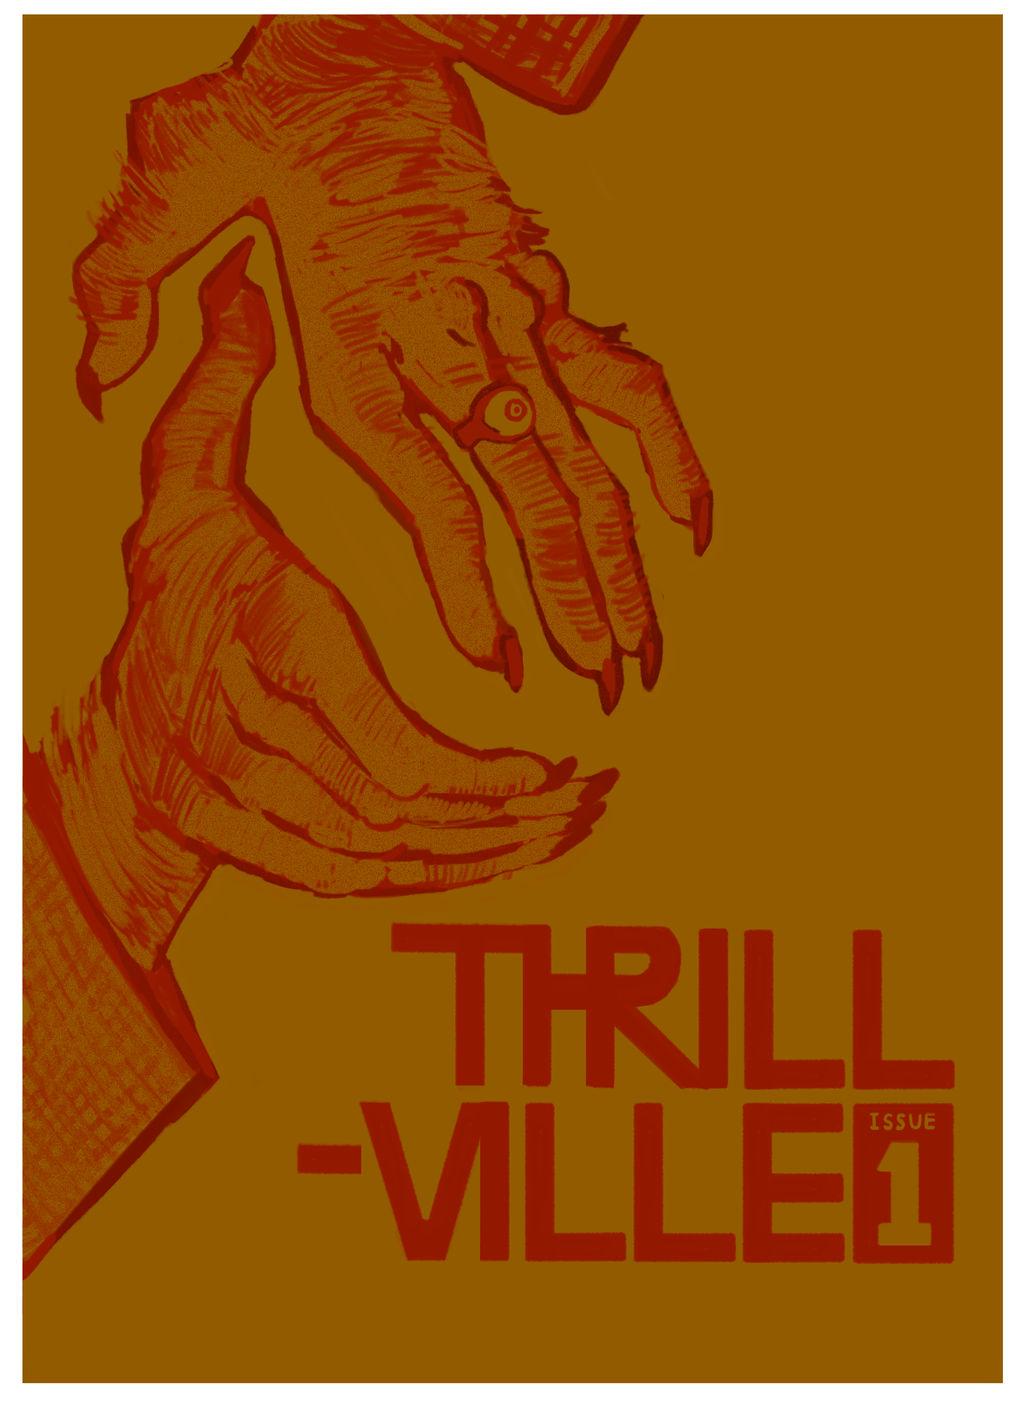 THRILL-VILLE 1 by Muttonchomp